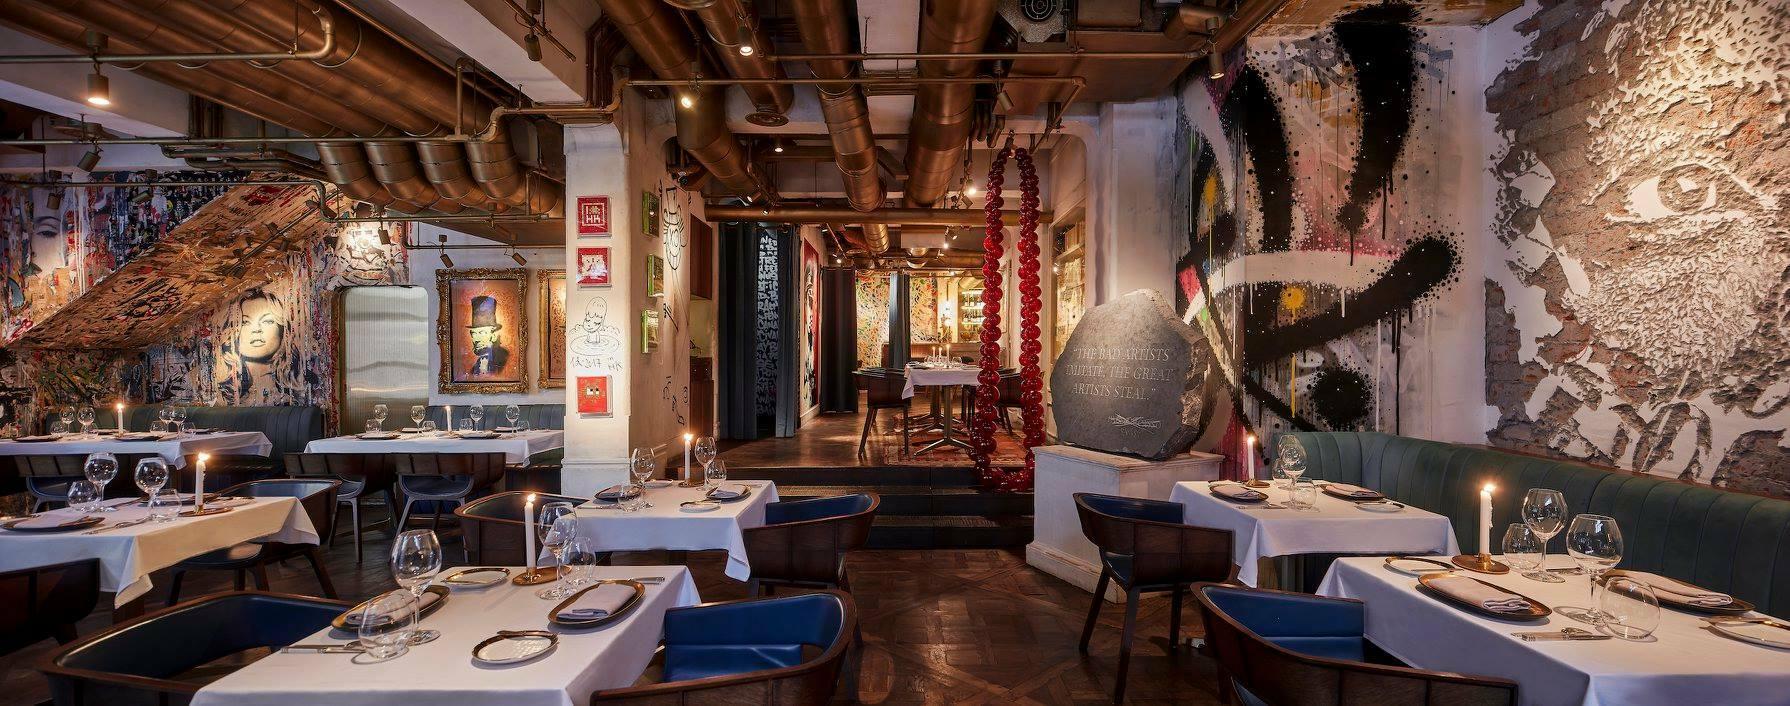 Bibo Restaurant Hong Kong